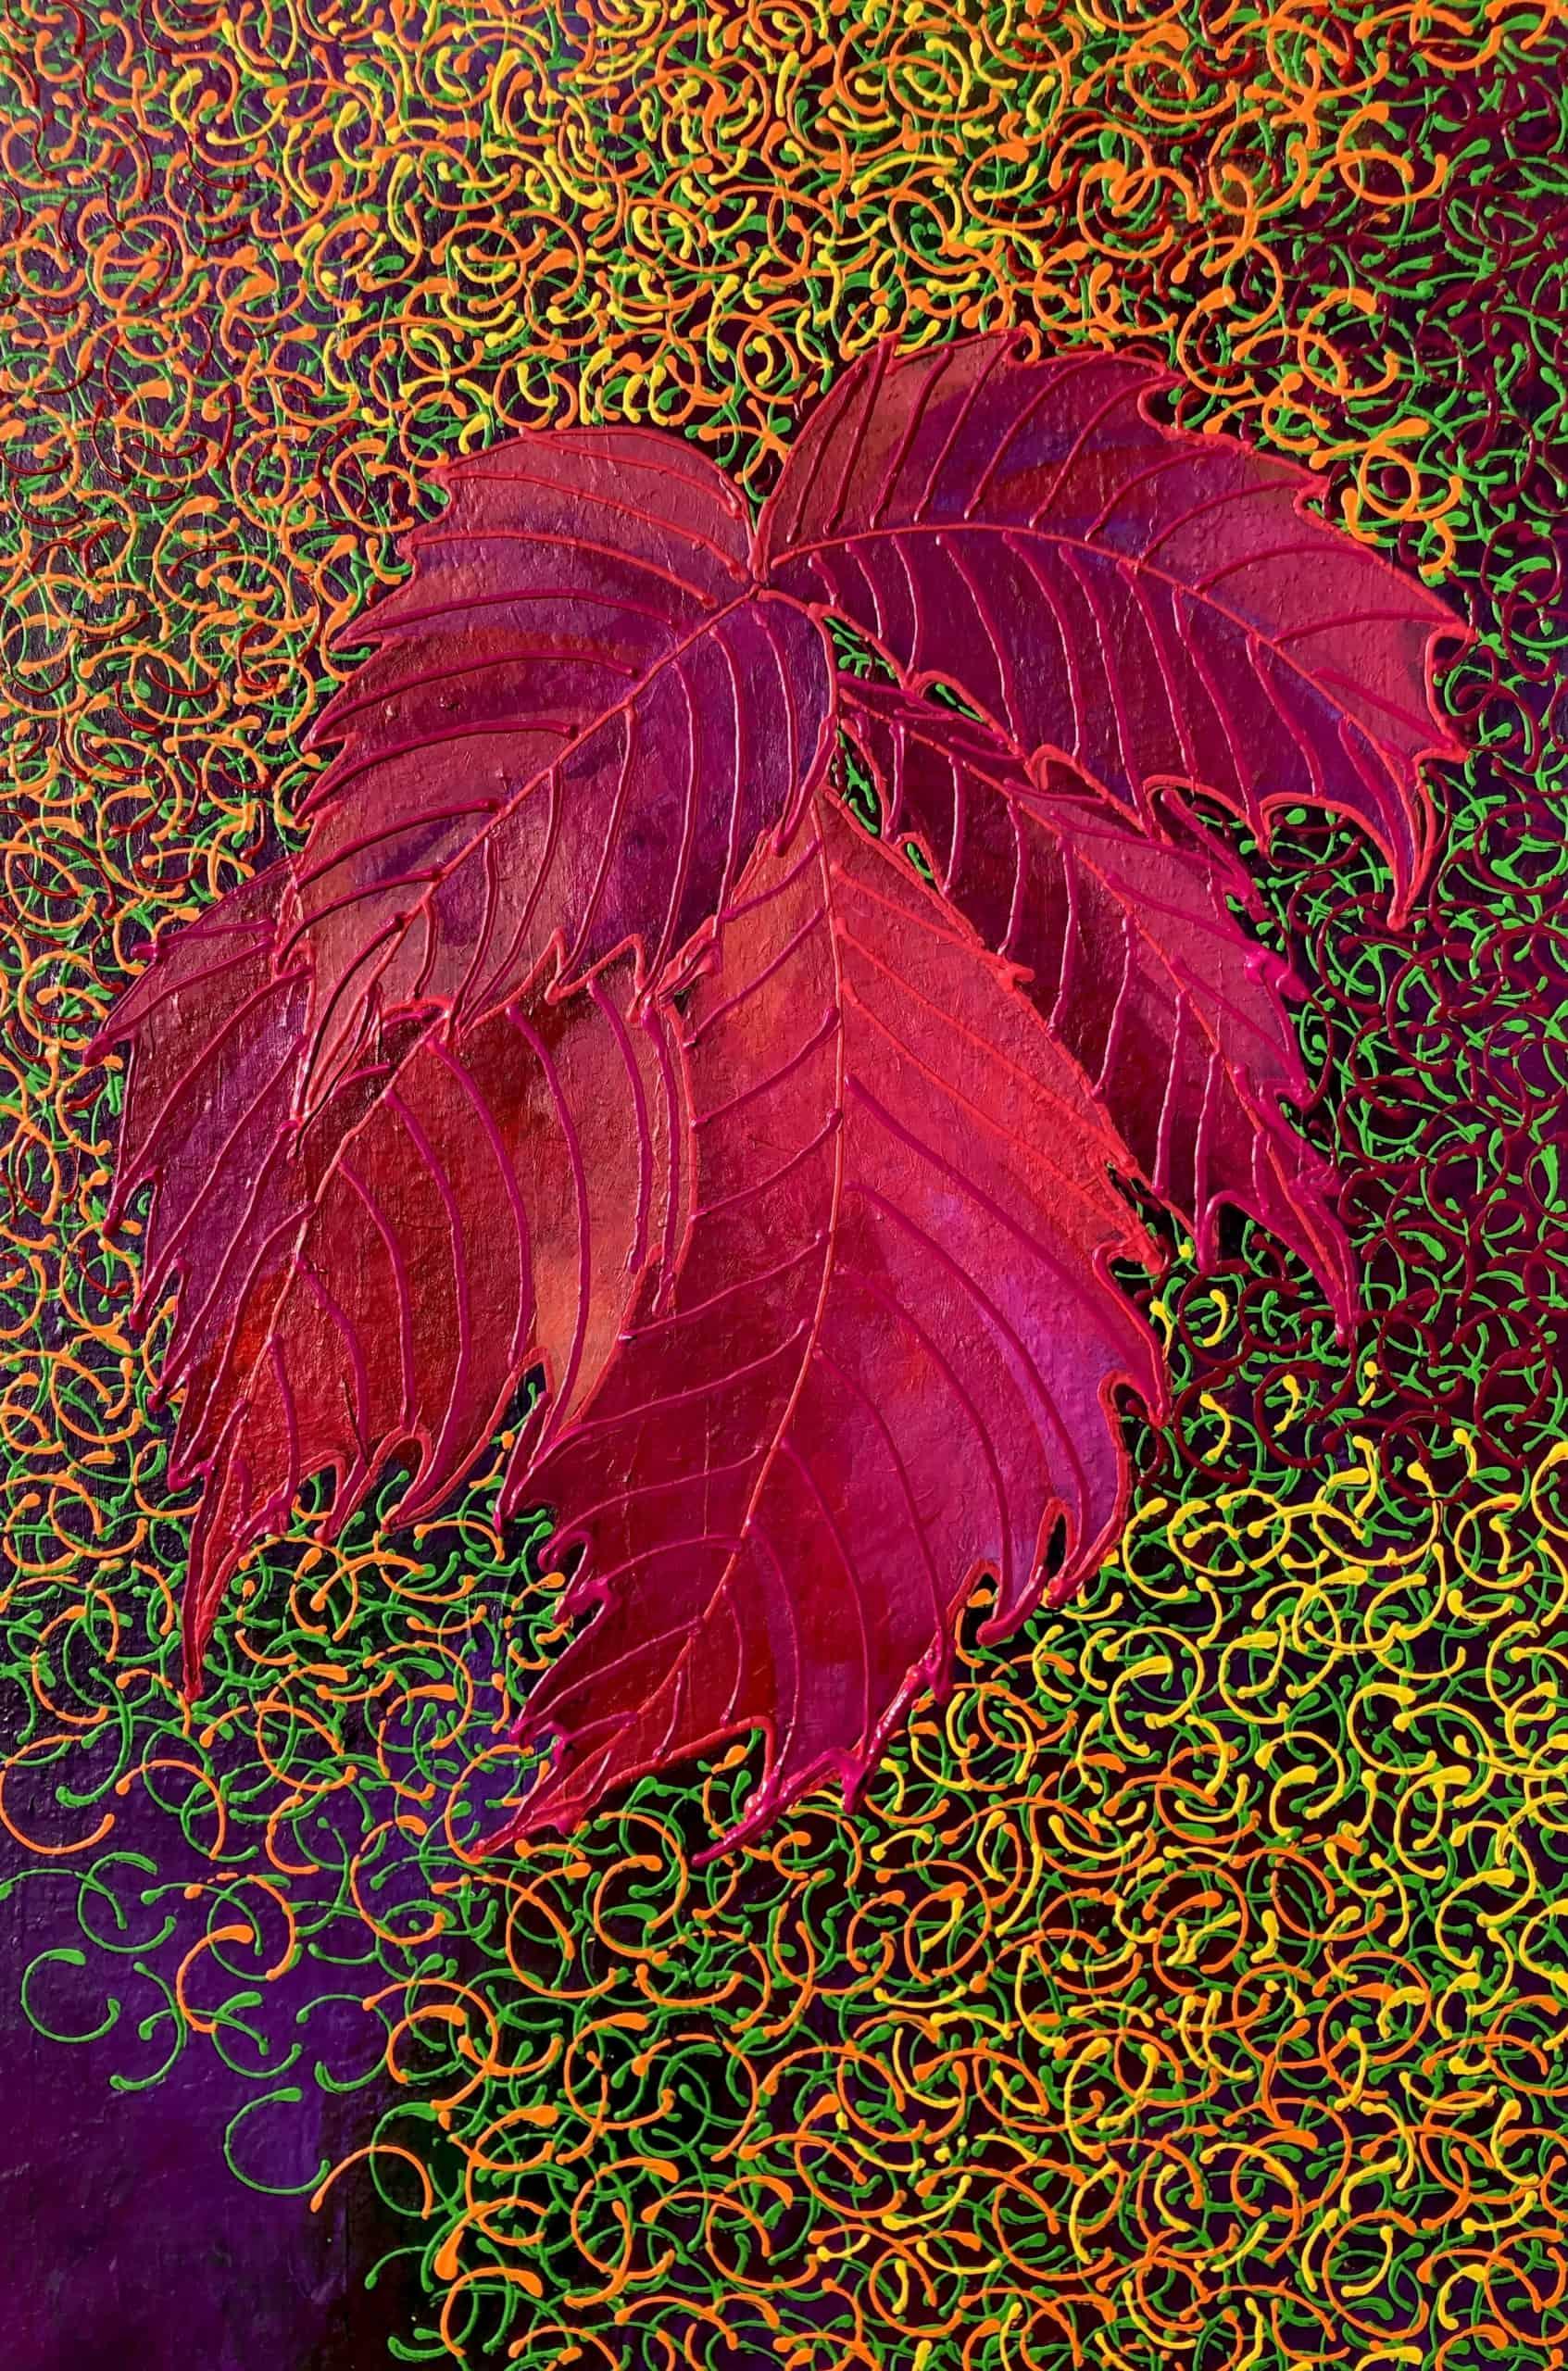 f7-9_SOLD_Autumn2019#1_90x50